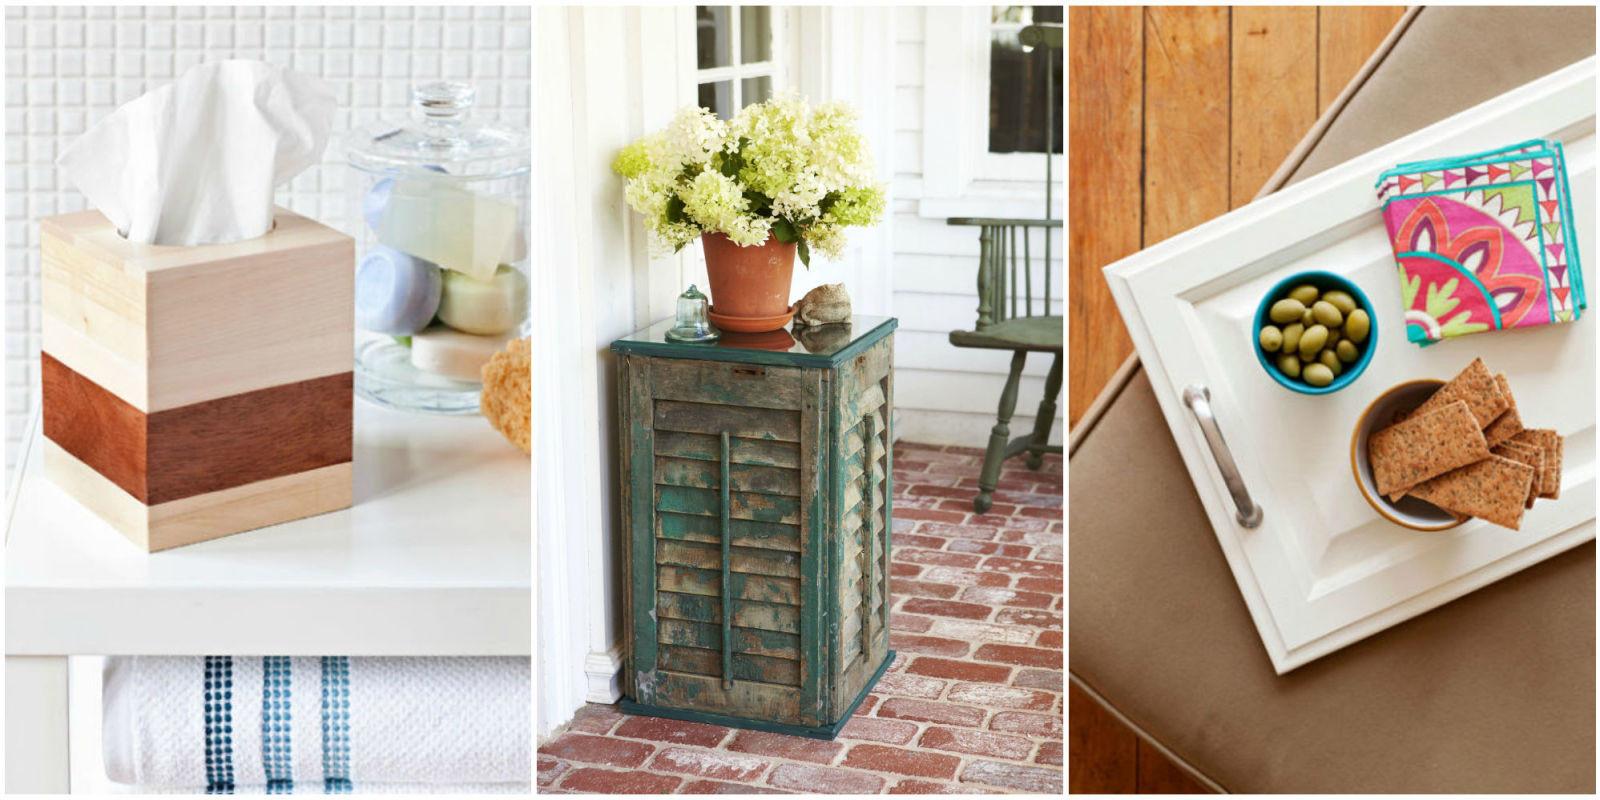 Diy Home Ideas  DIY Home Decor Cheap Home Decorating Ideas